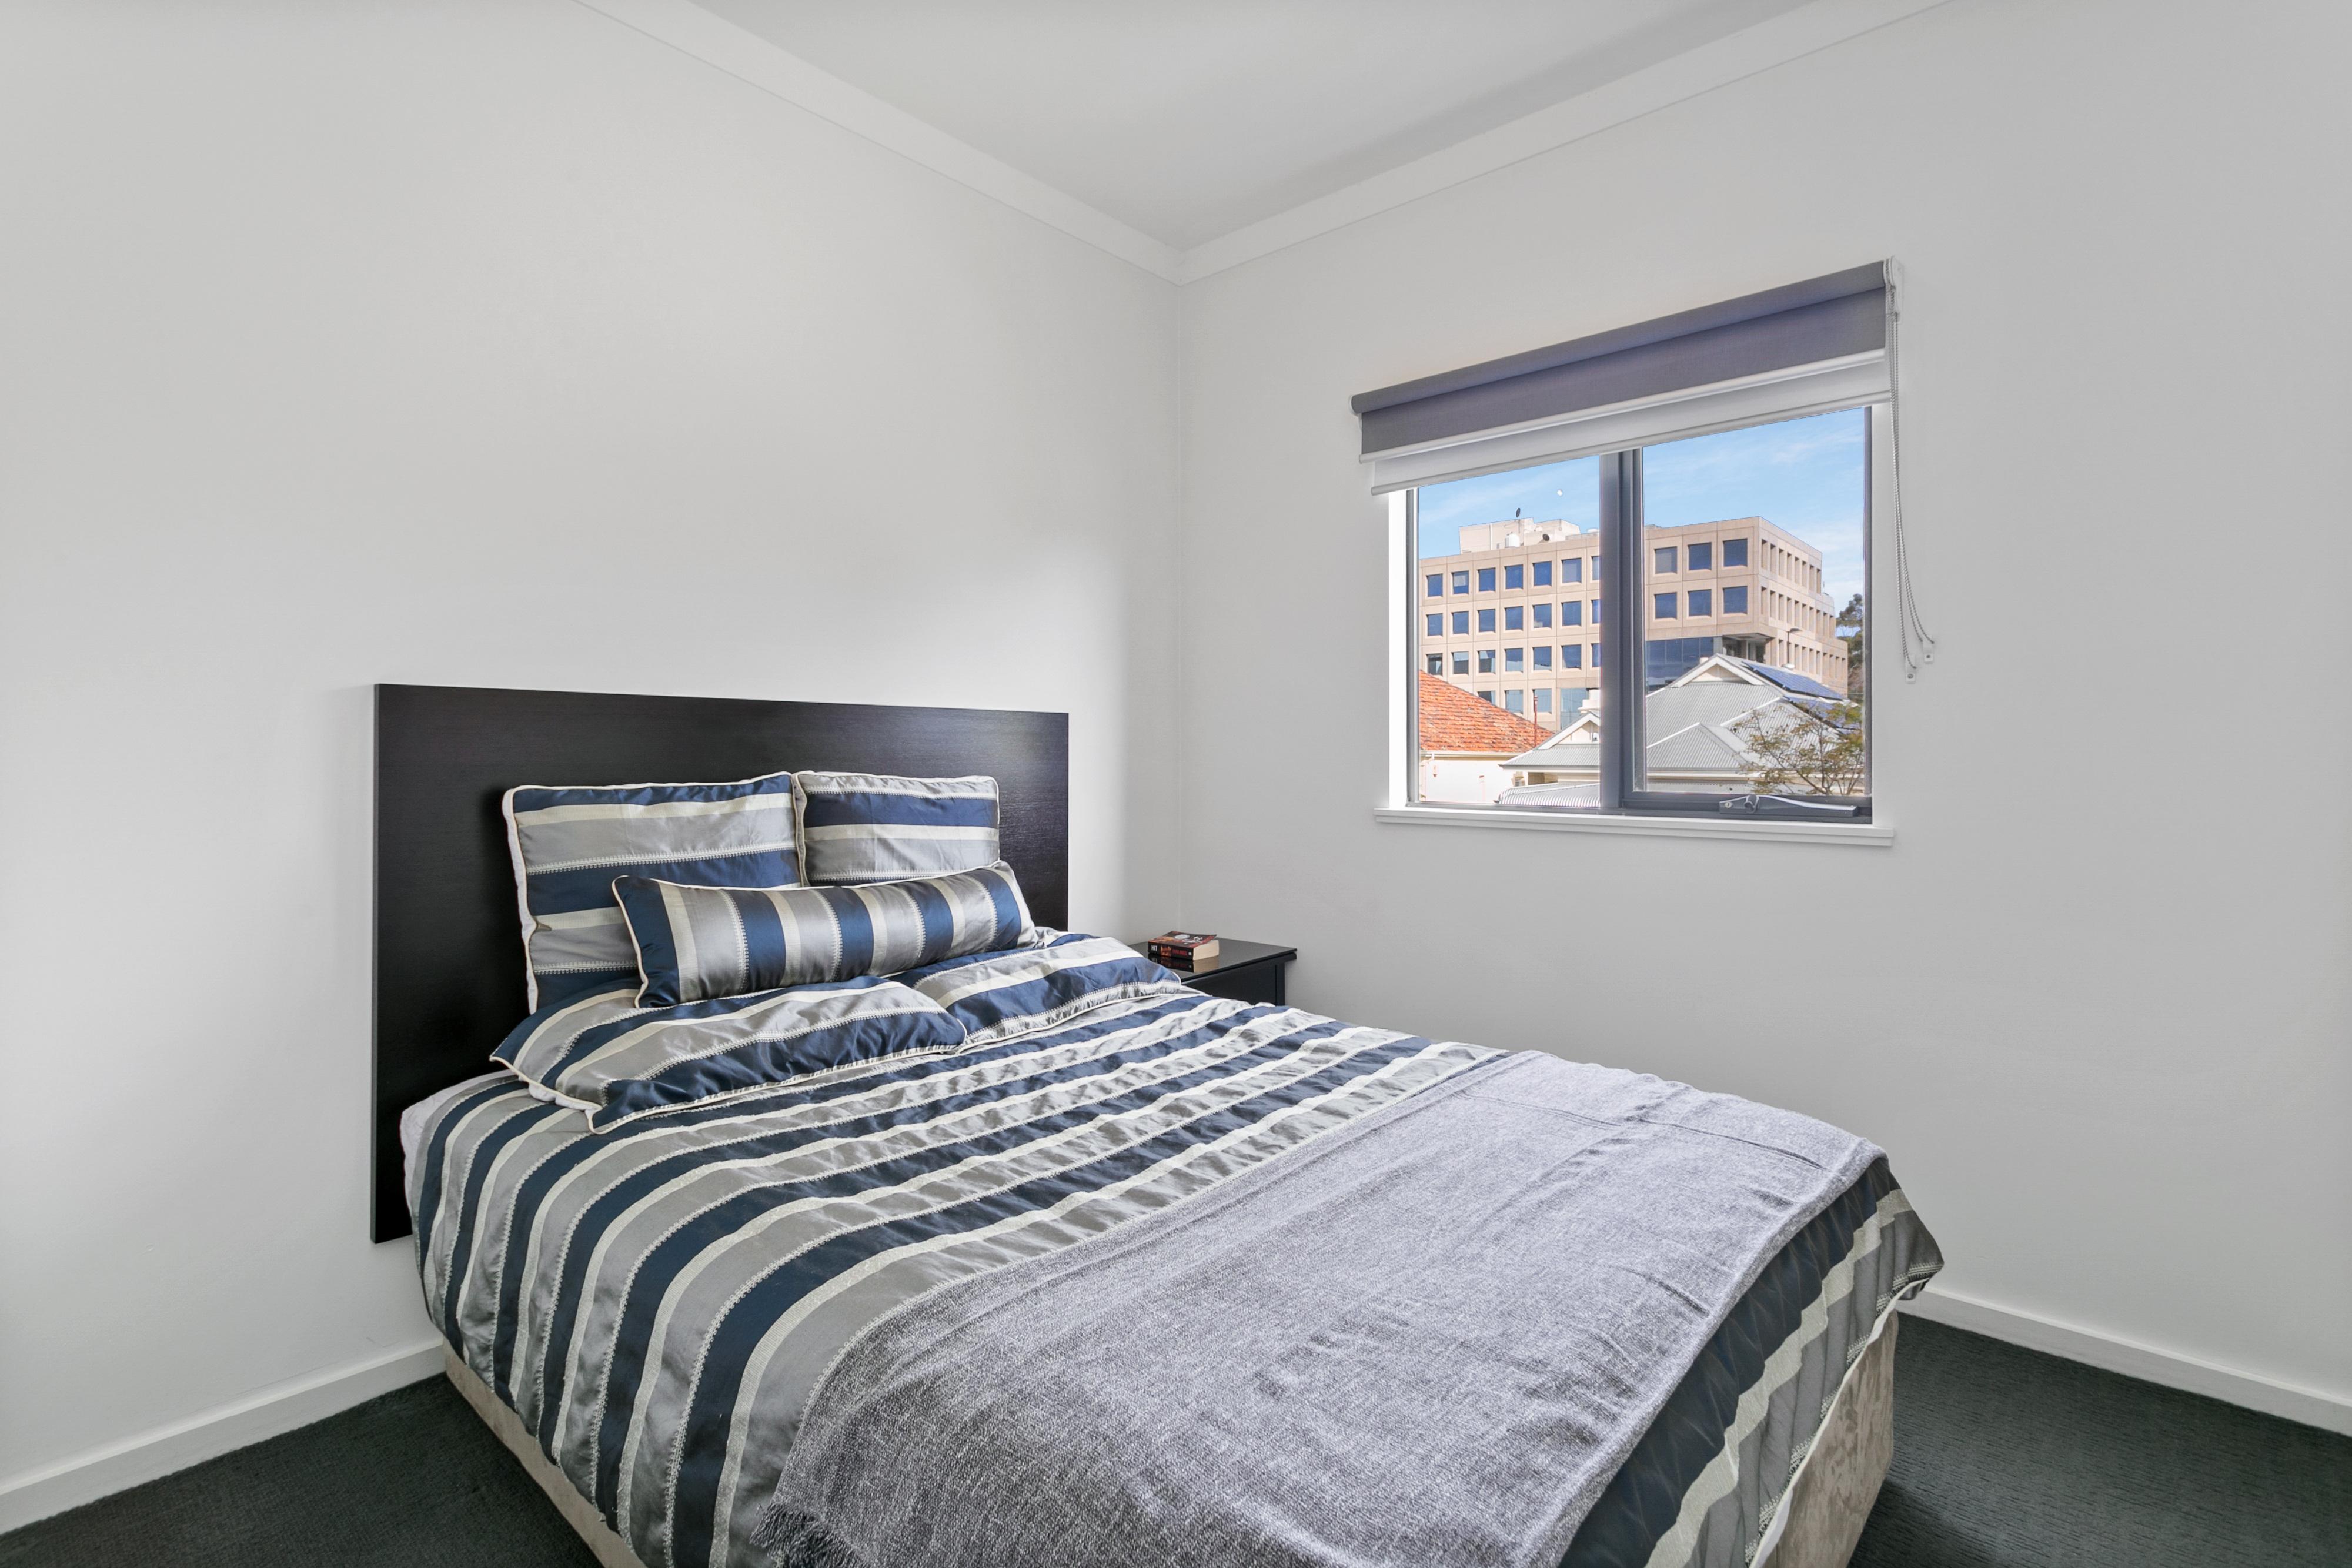 PRINT 101 18 Rheola St, West Perth 06